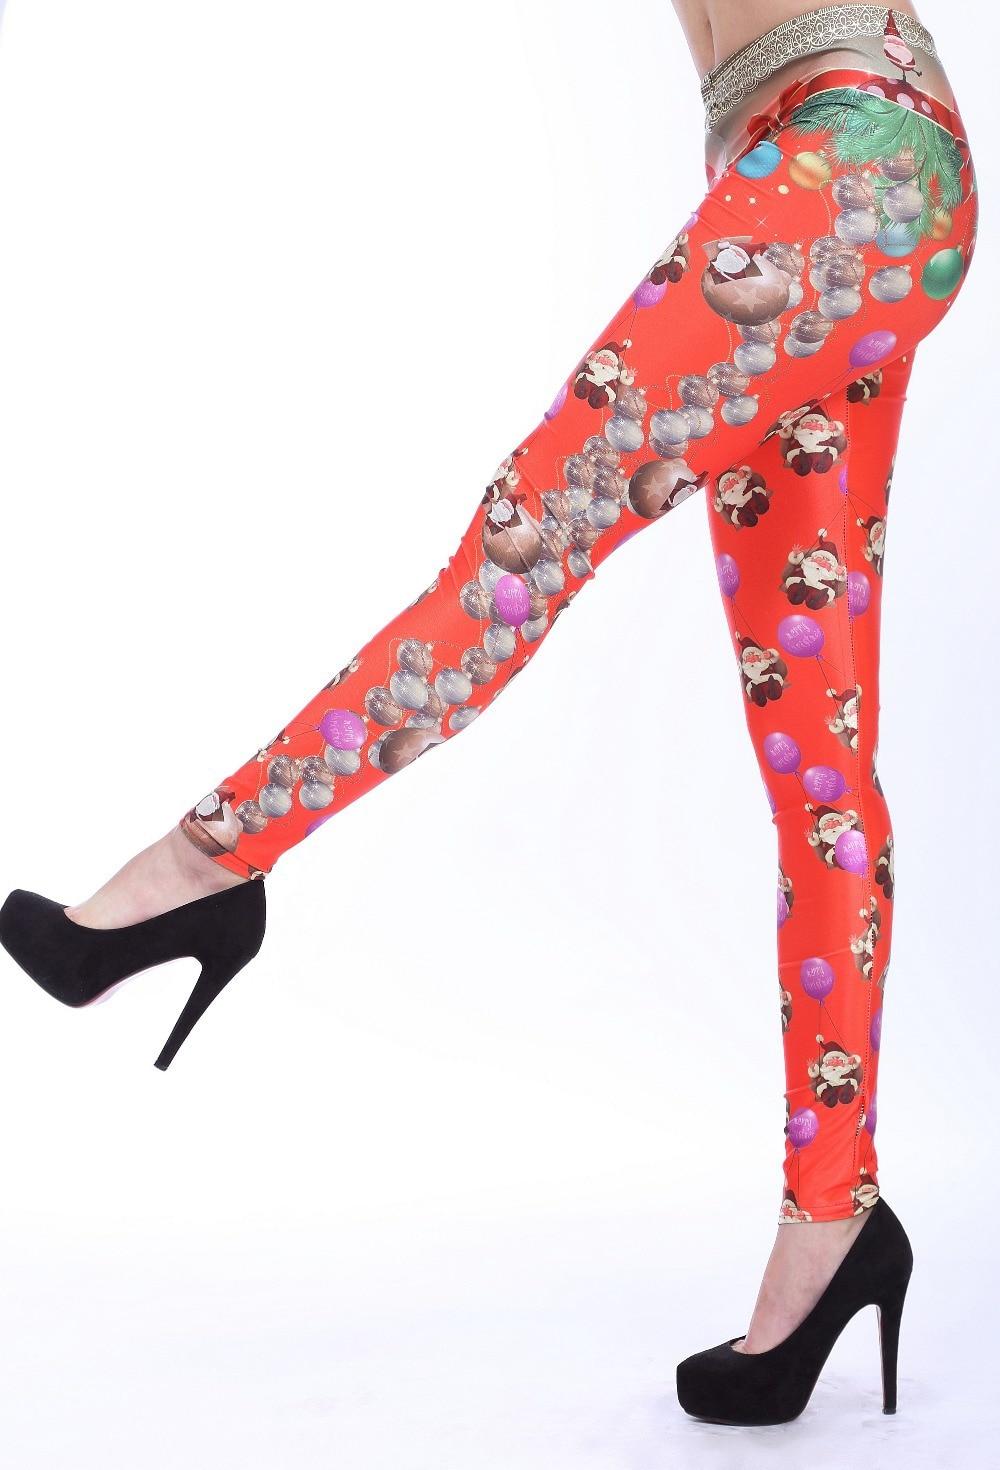 395f45d4f66 Plus Size Christmas Leggings Santa Claus Leggins Women Clothing Elastic  Female Pants Trousers Slim Women Pencil Pants 2015 -in Leggings from Women s  ...